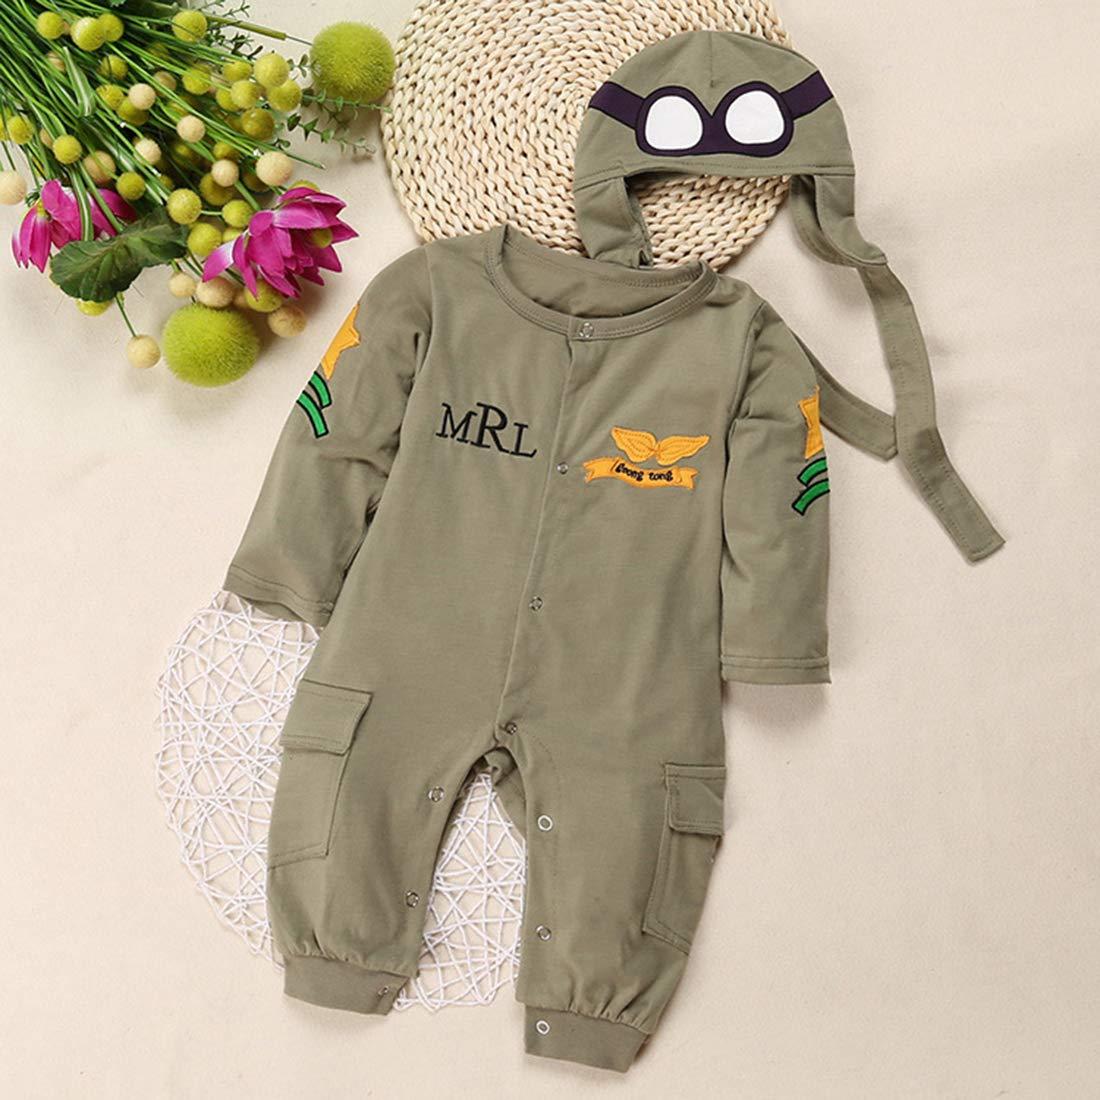 Decha Newborn Baby Pilot Two-Piece Layette Set Baby Onesie Halloween Costume